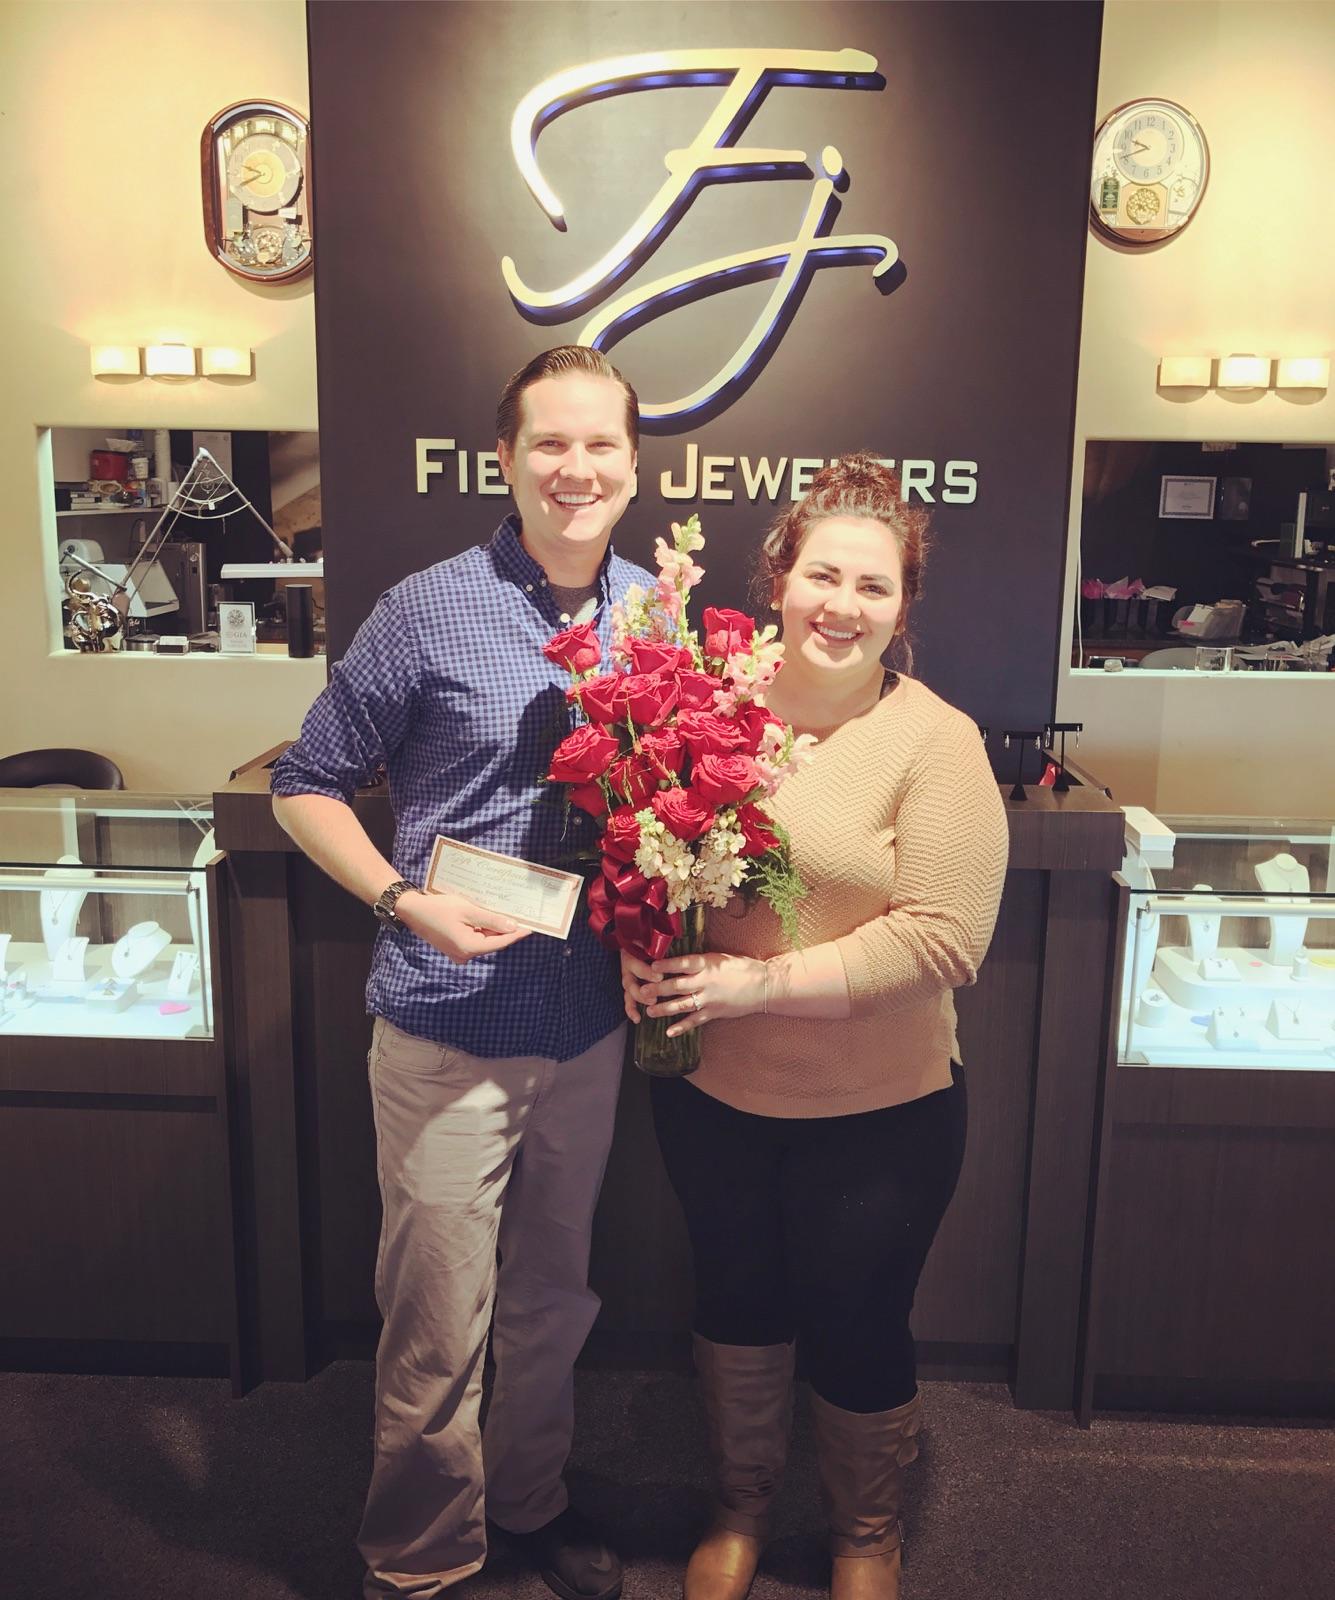 GRand prize Winners • REDDING BRIDAL SHOW • Fields Jewelers